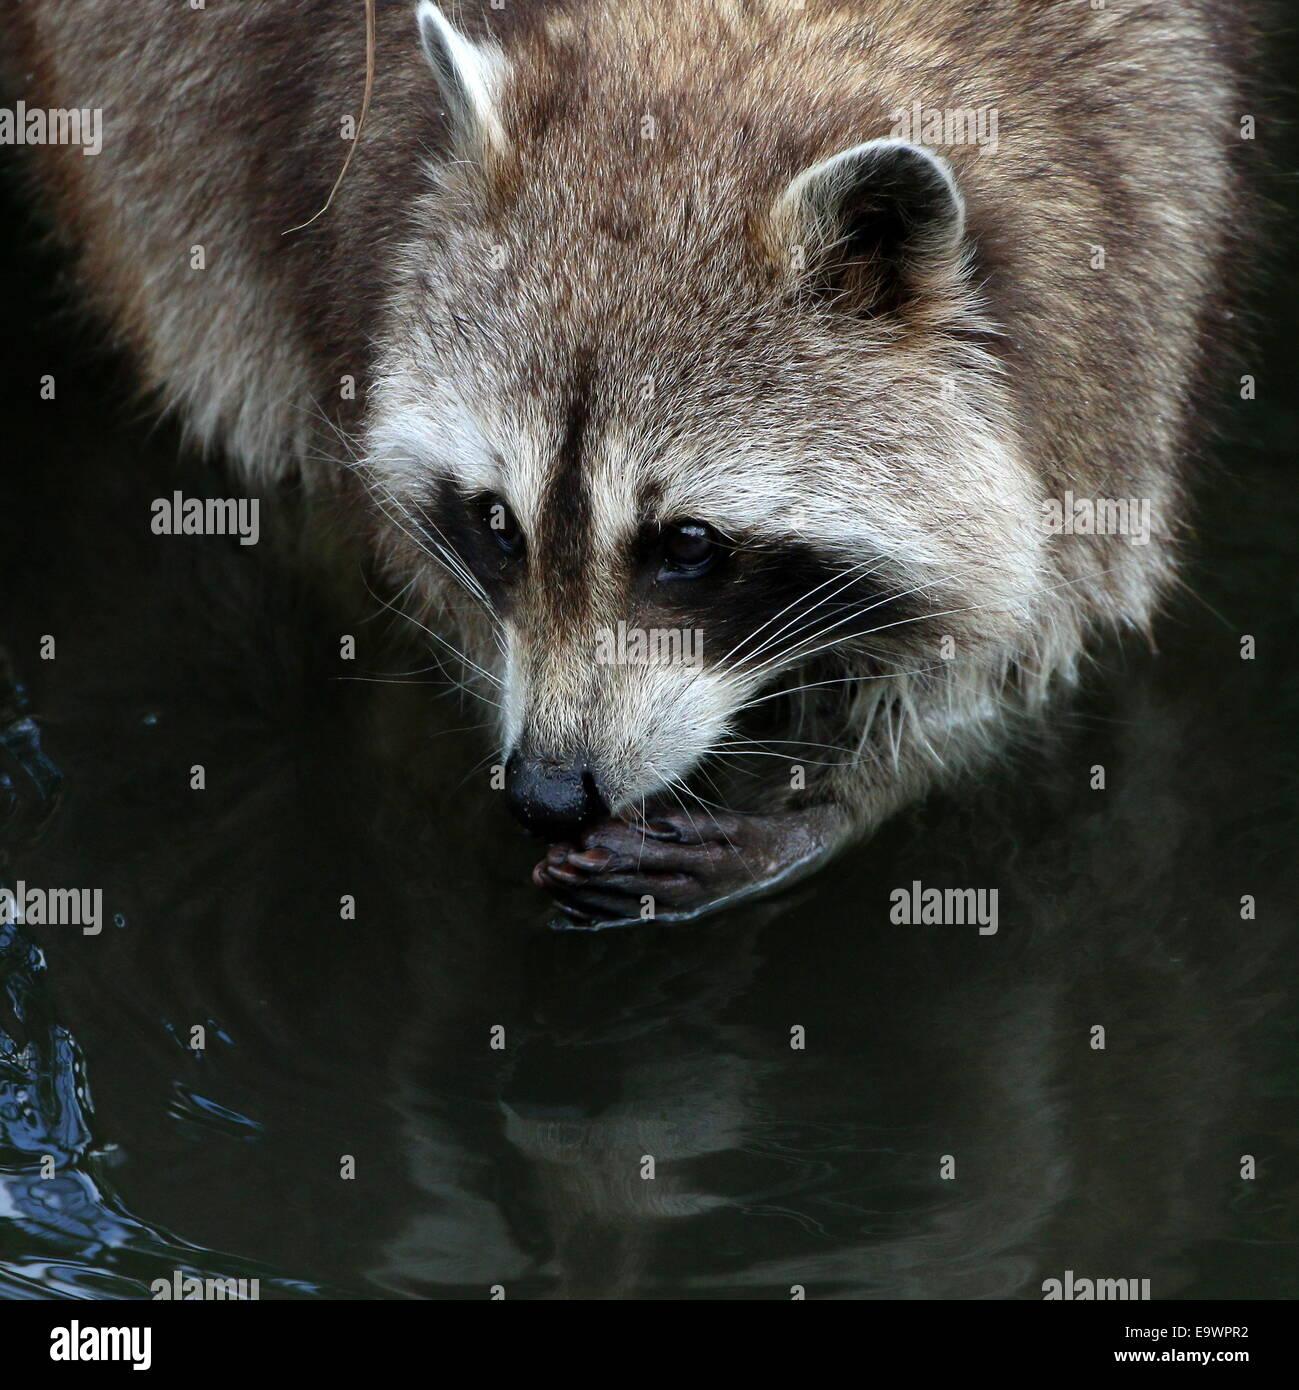 Raccoon Eating Food Stock Photos Raccoon Eating Food Stock Images